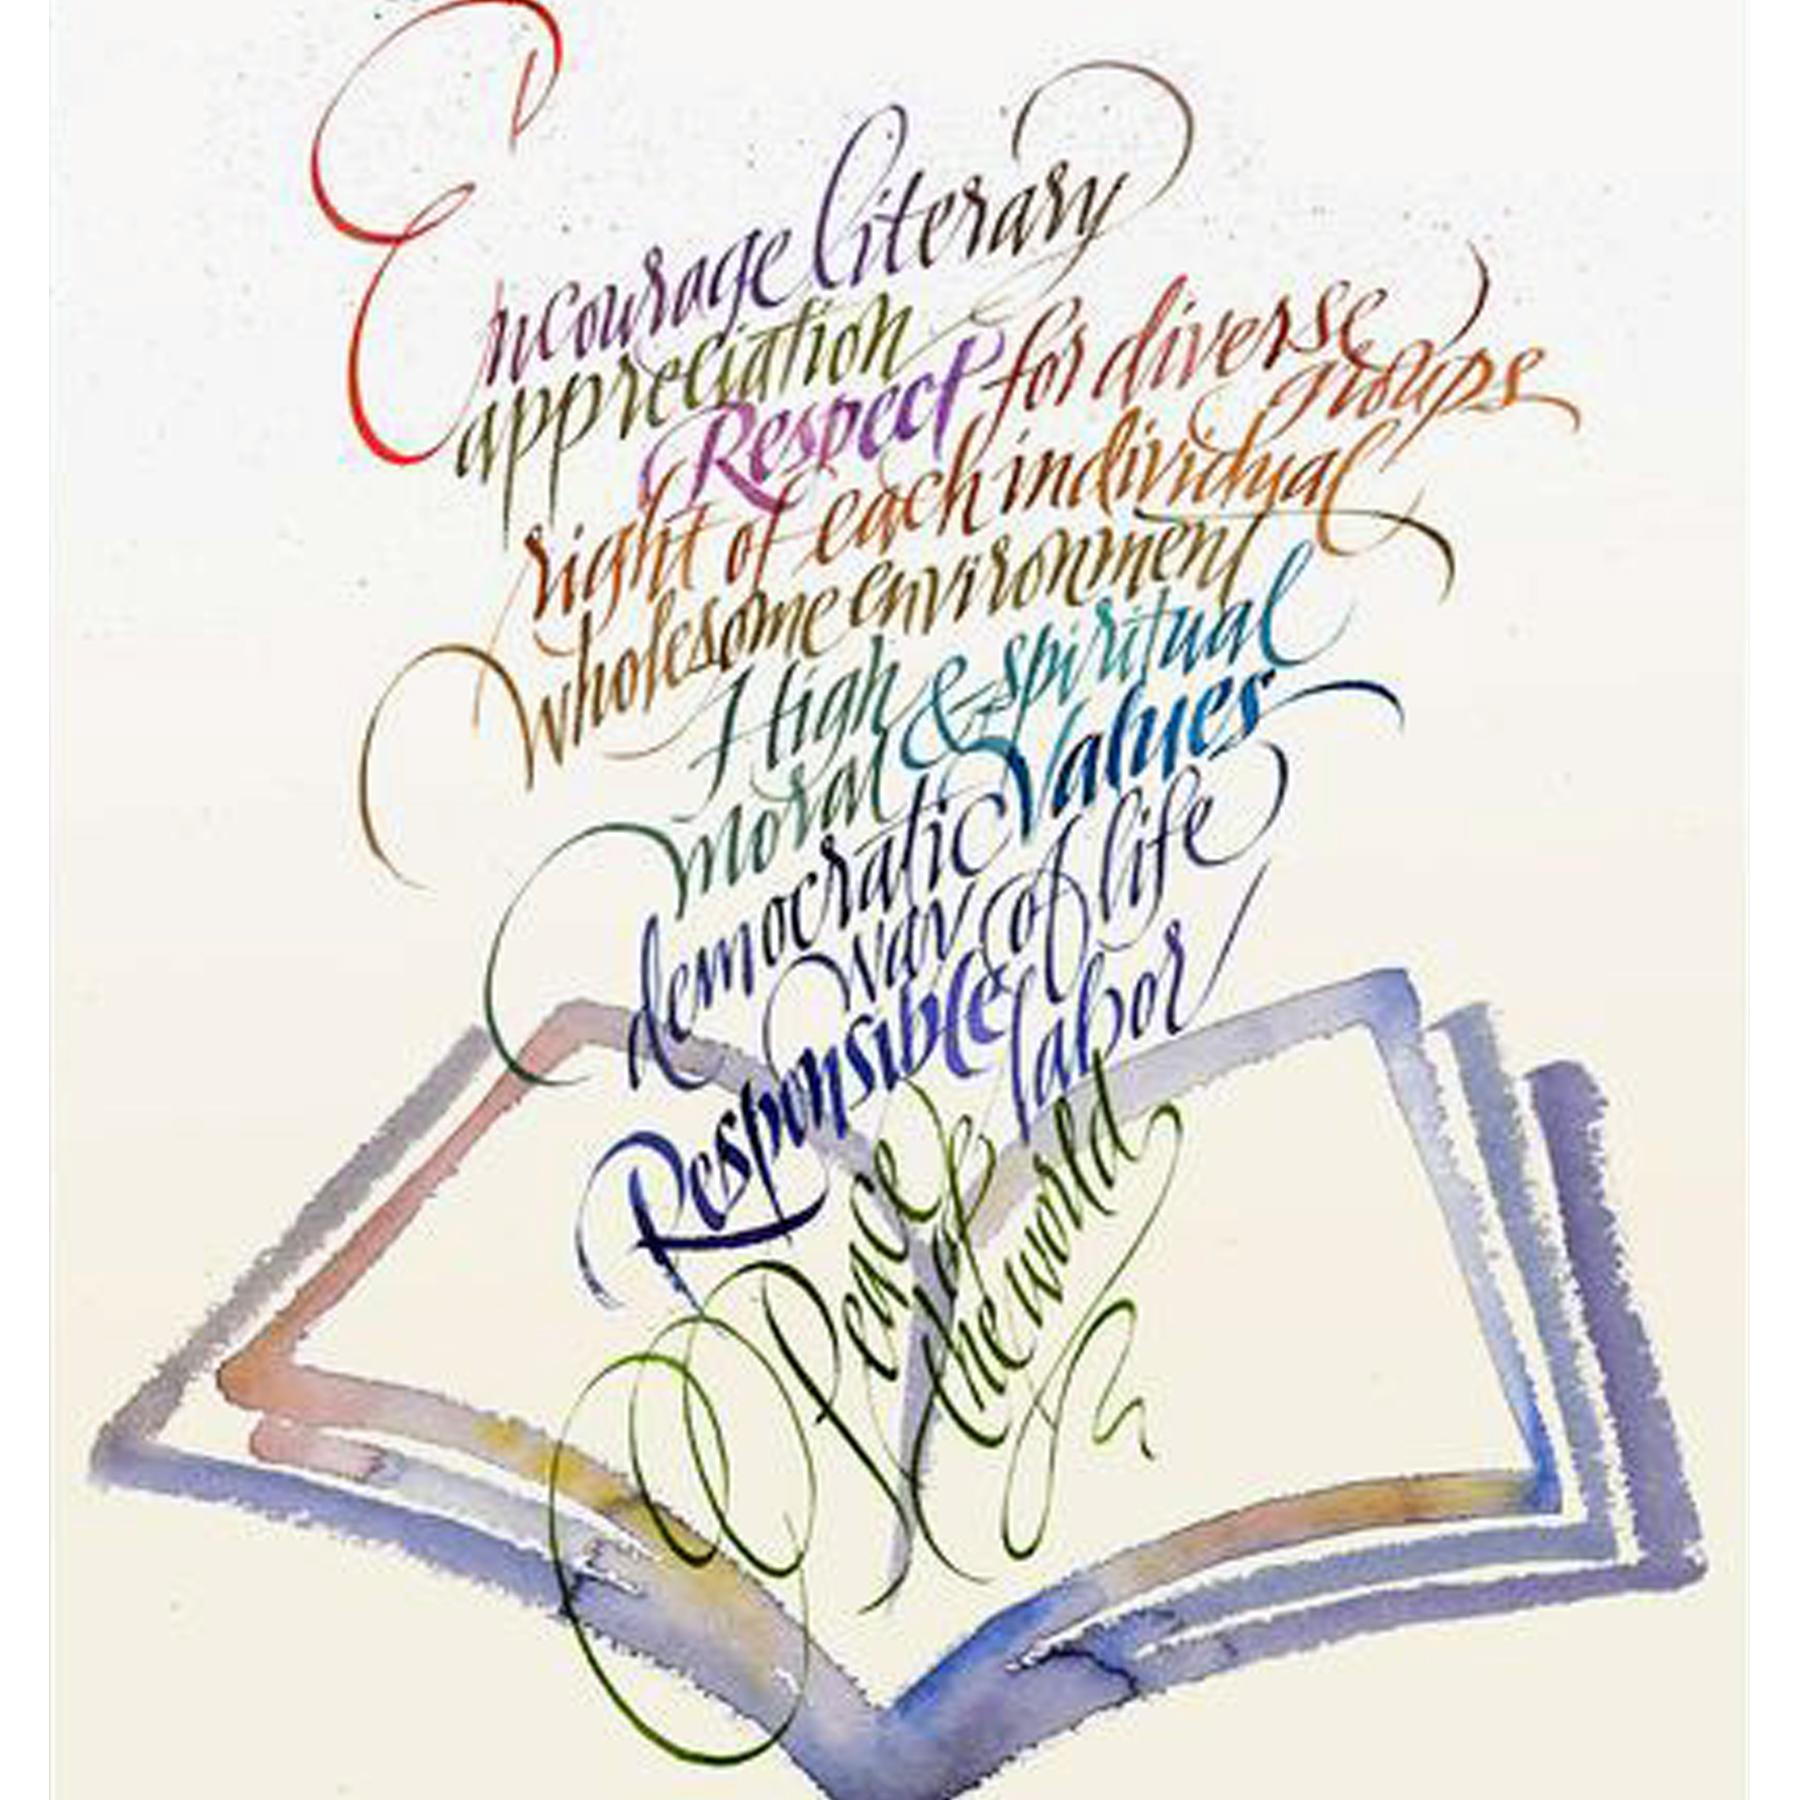 literaryappreciation